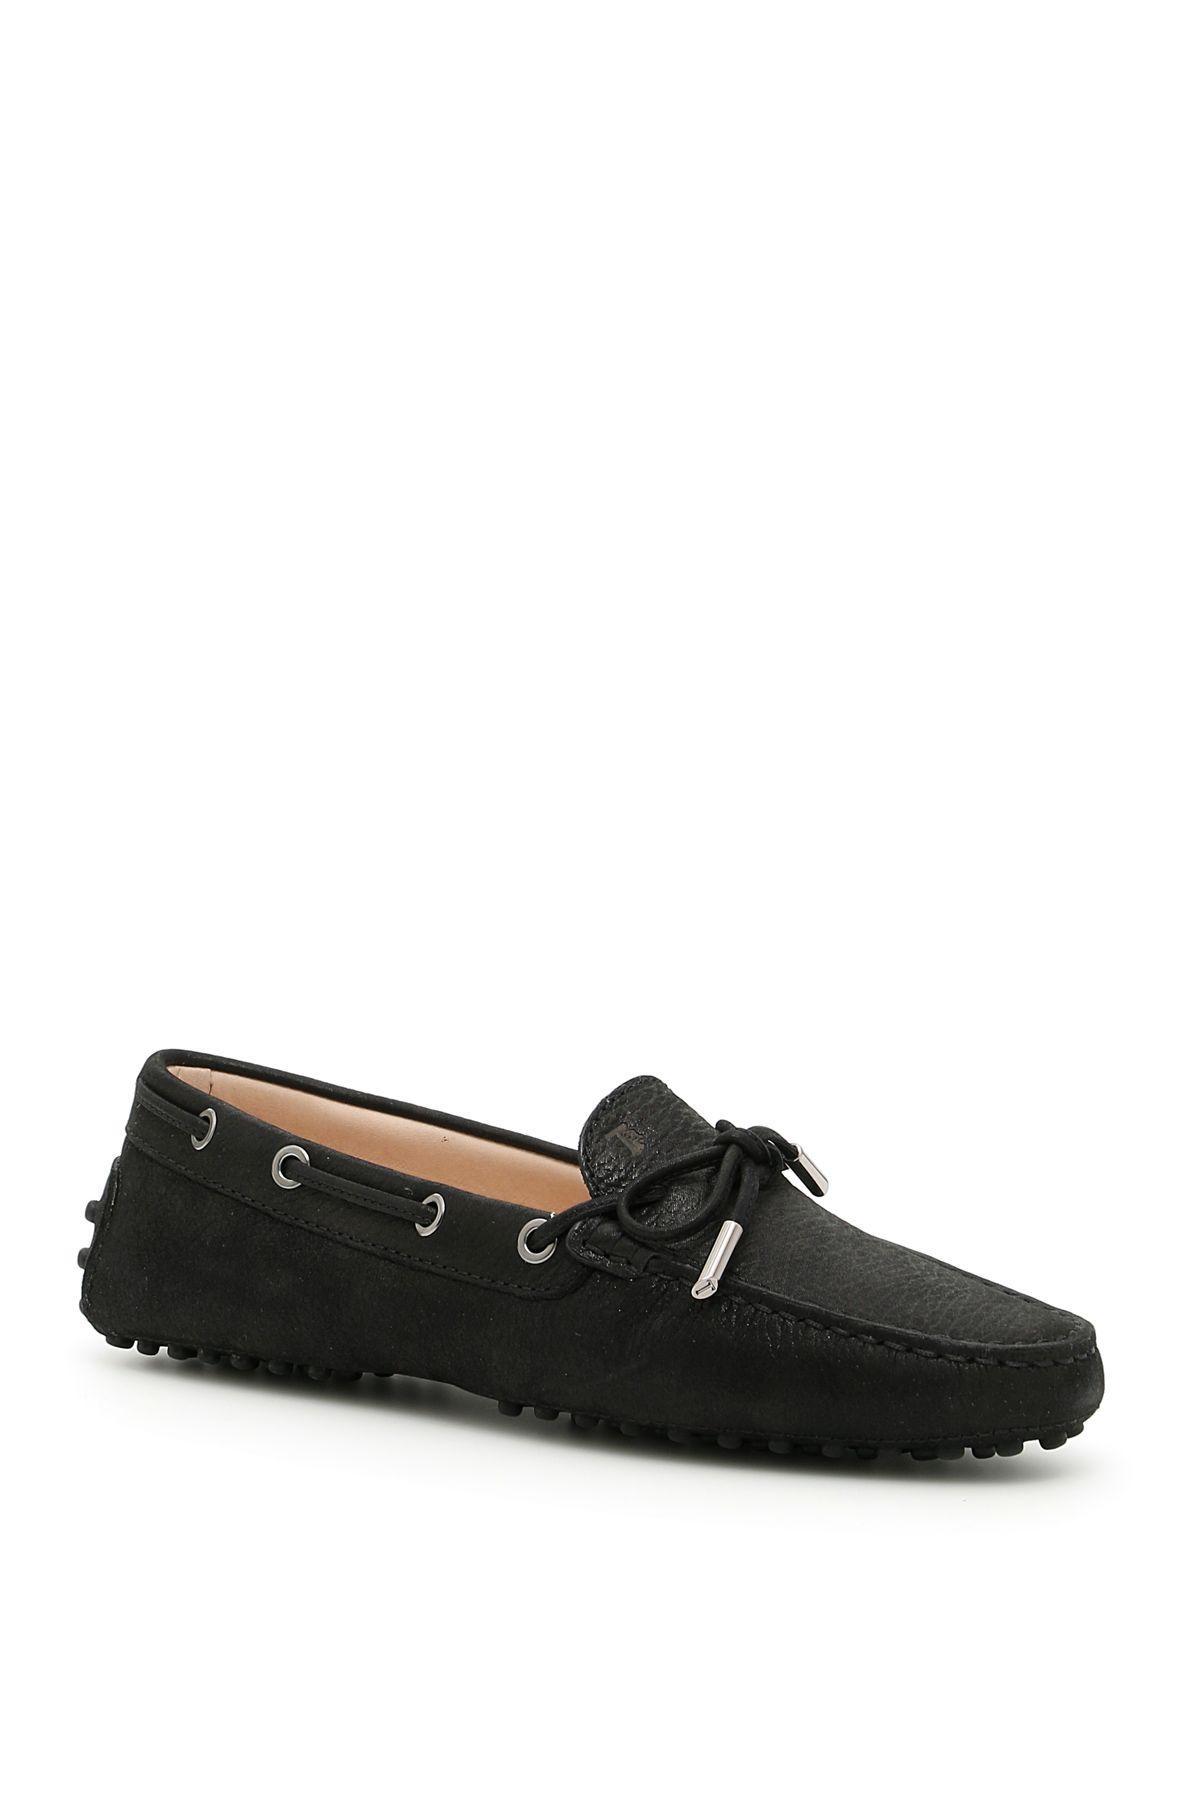 Tod's City Gommino Loafers In Neronero